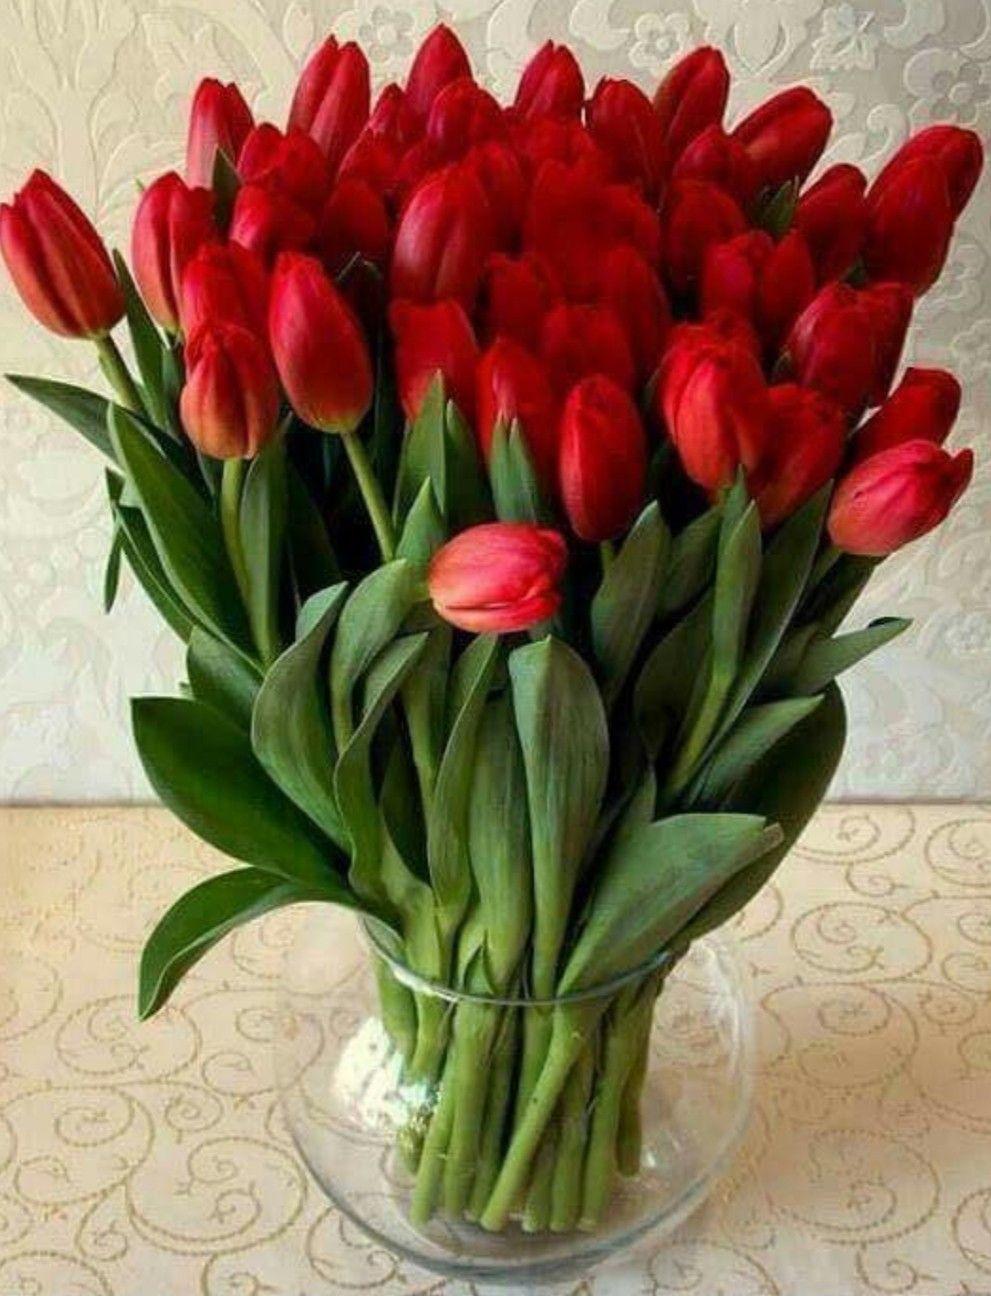 Pin By Sharron Myers On Flowers In 2020 Spring Flowers Tulips Arrangement Beautiful Flowers